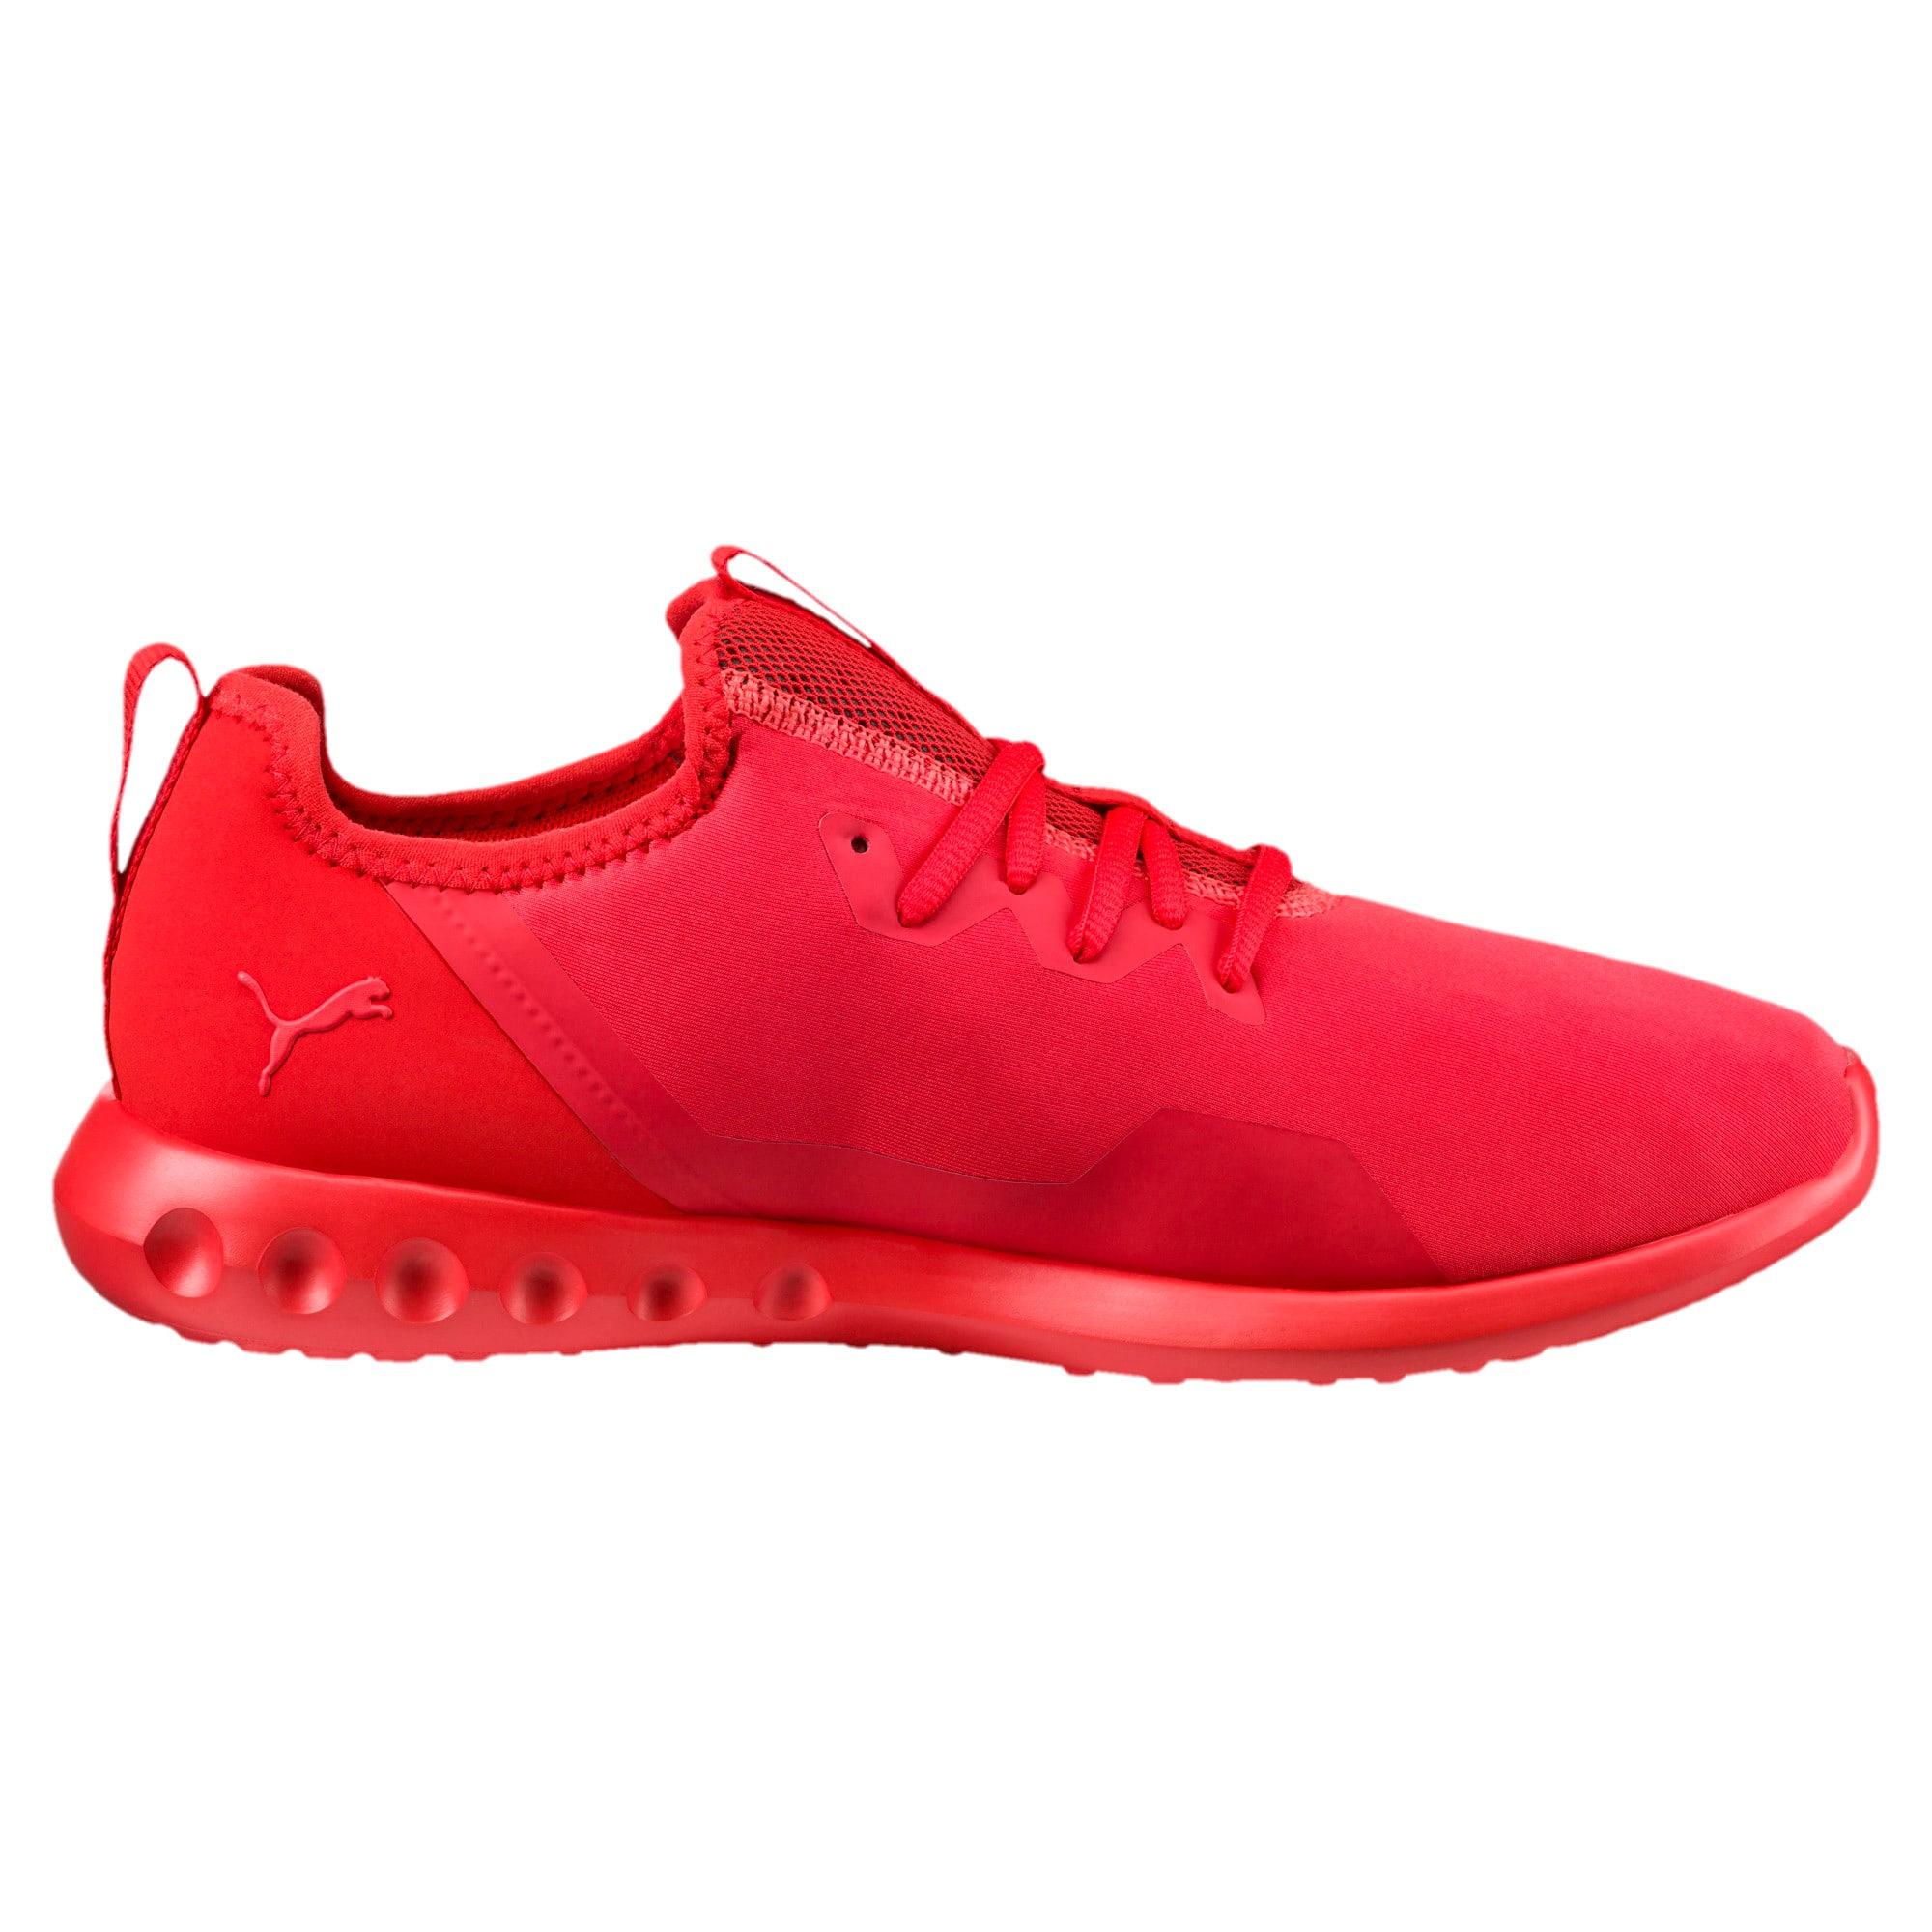 Thumbnail 3 of Carson 2 X Men's Running Shoes, High Risk Red, medium